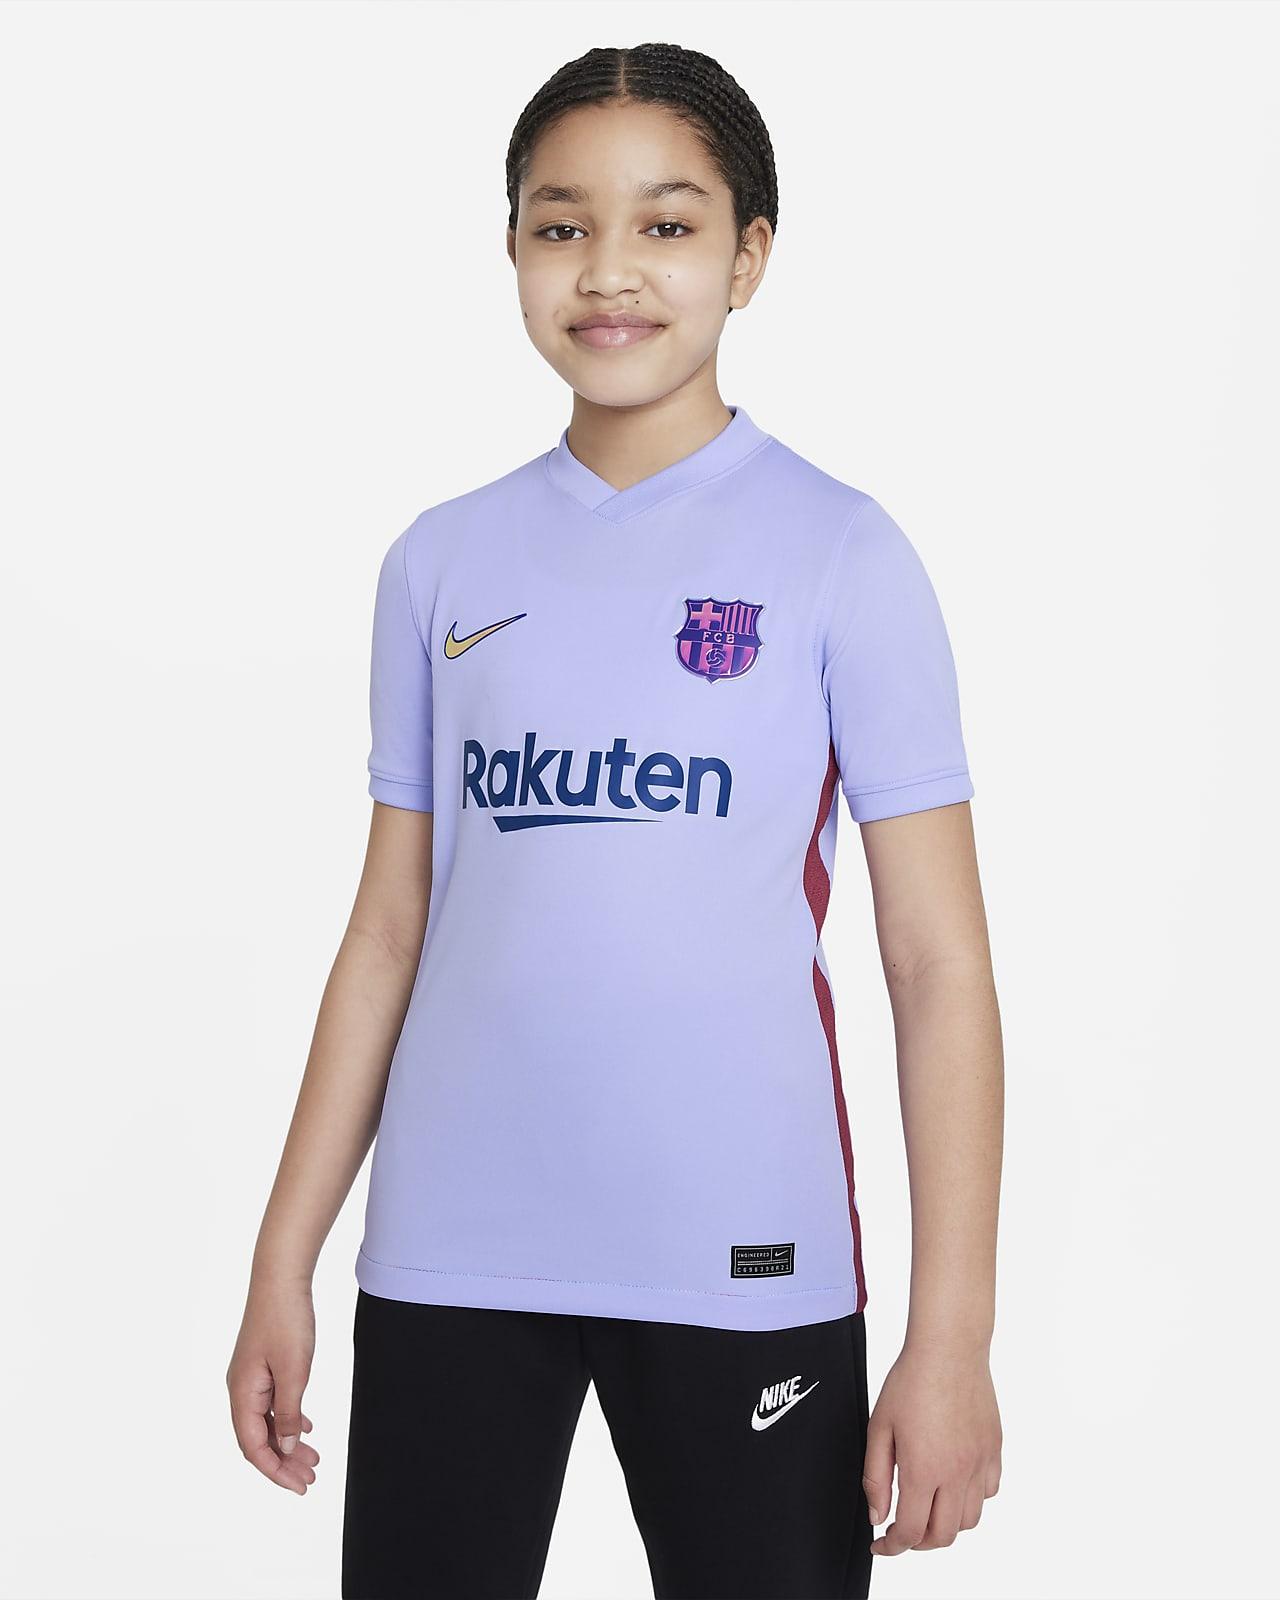 Camiseta de fútbol Nike Dri-FIT para niños talla grande FC Barcelona visitante 2021/22 Stadium